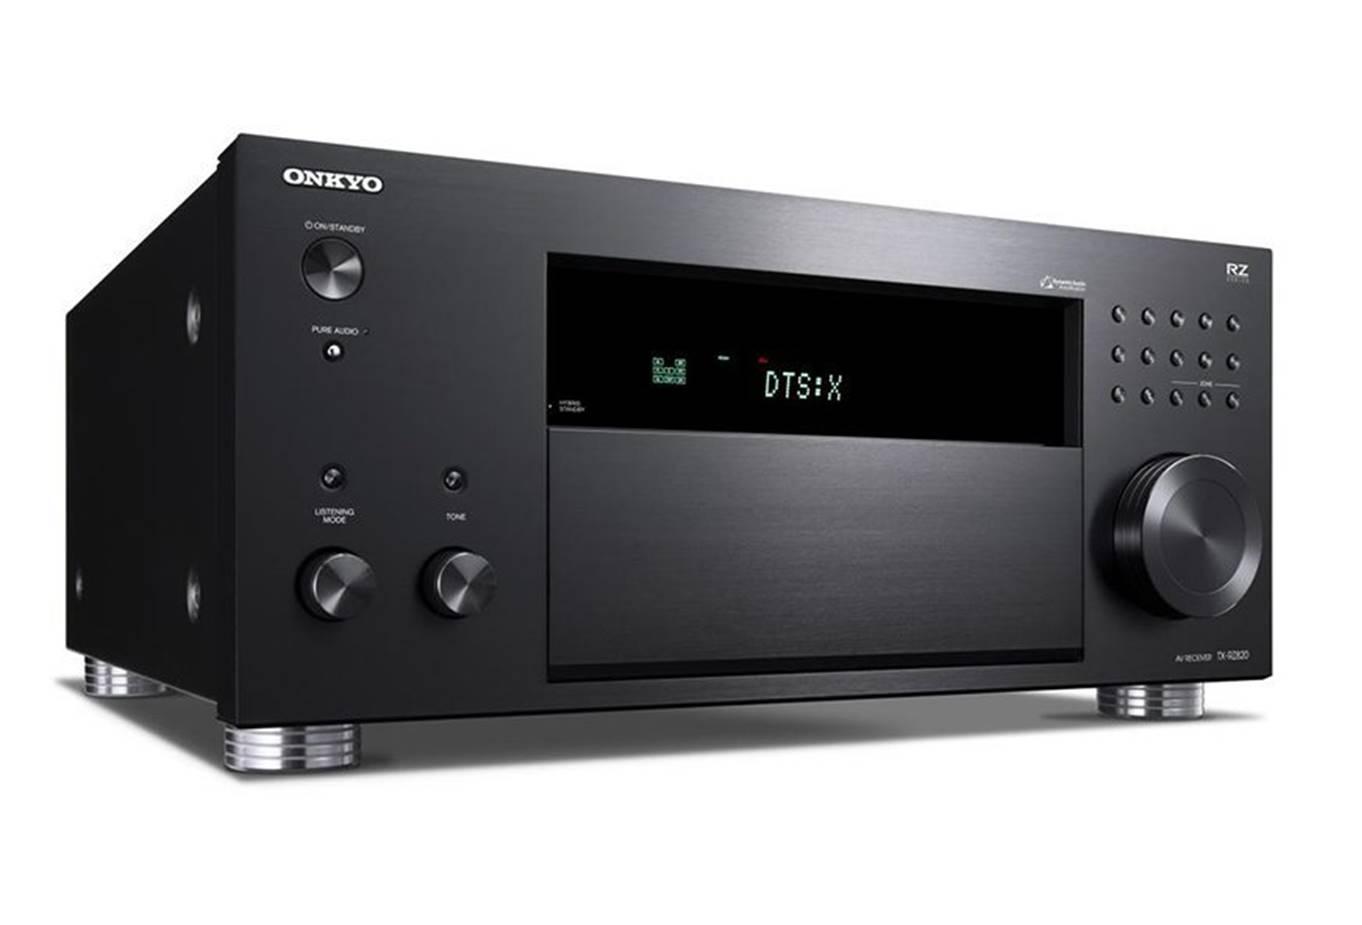 Onkyo TX-RZ820 Surround Sound Receiver